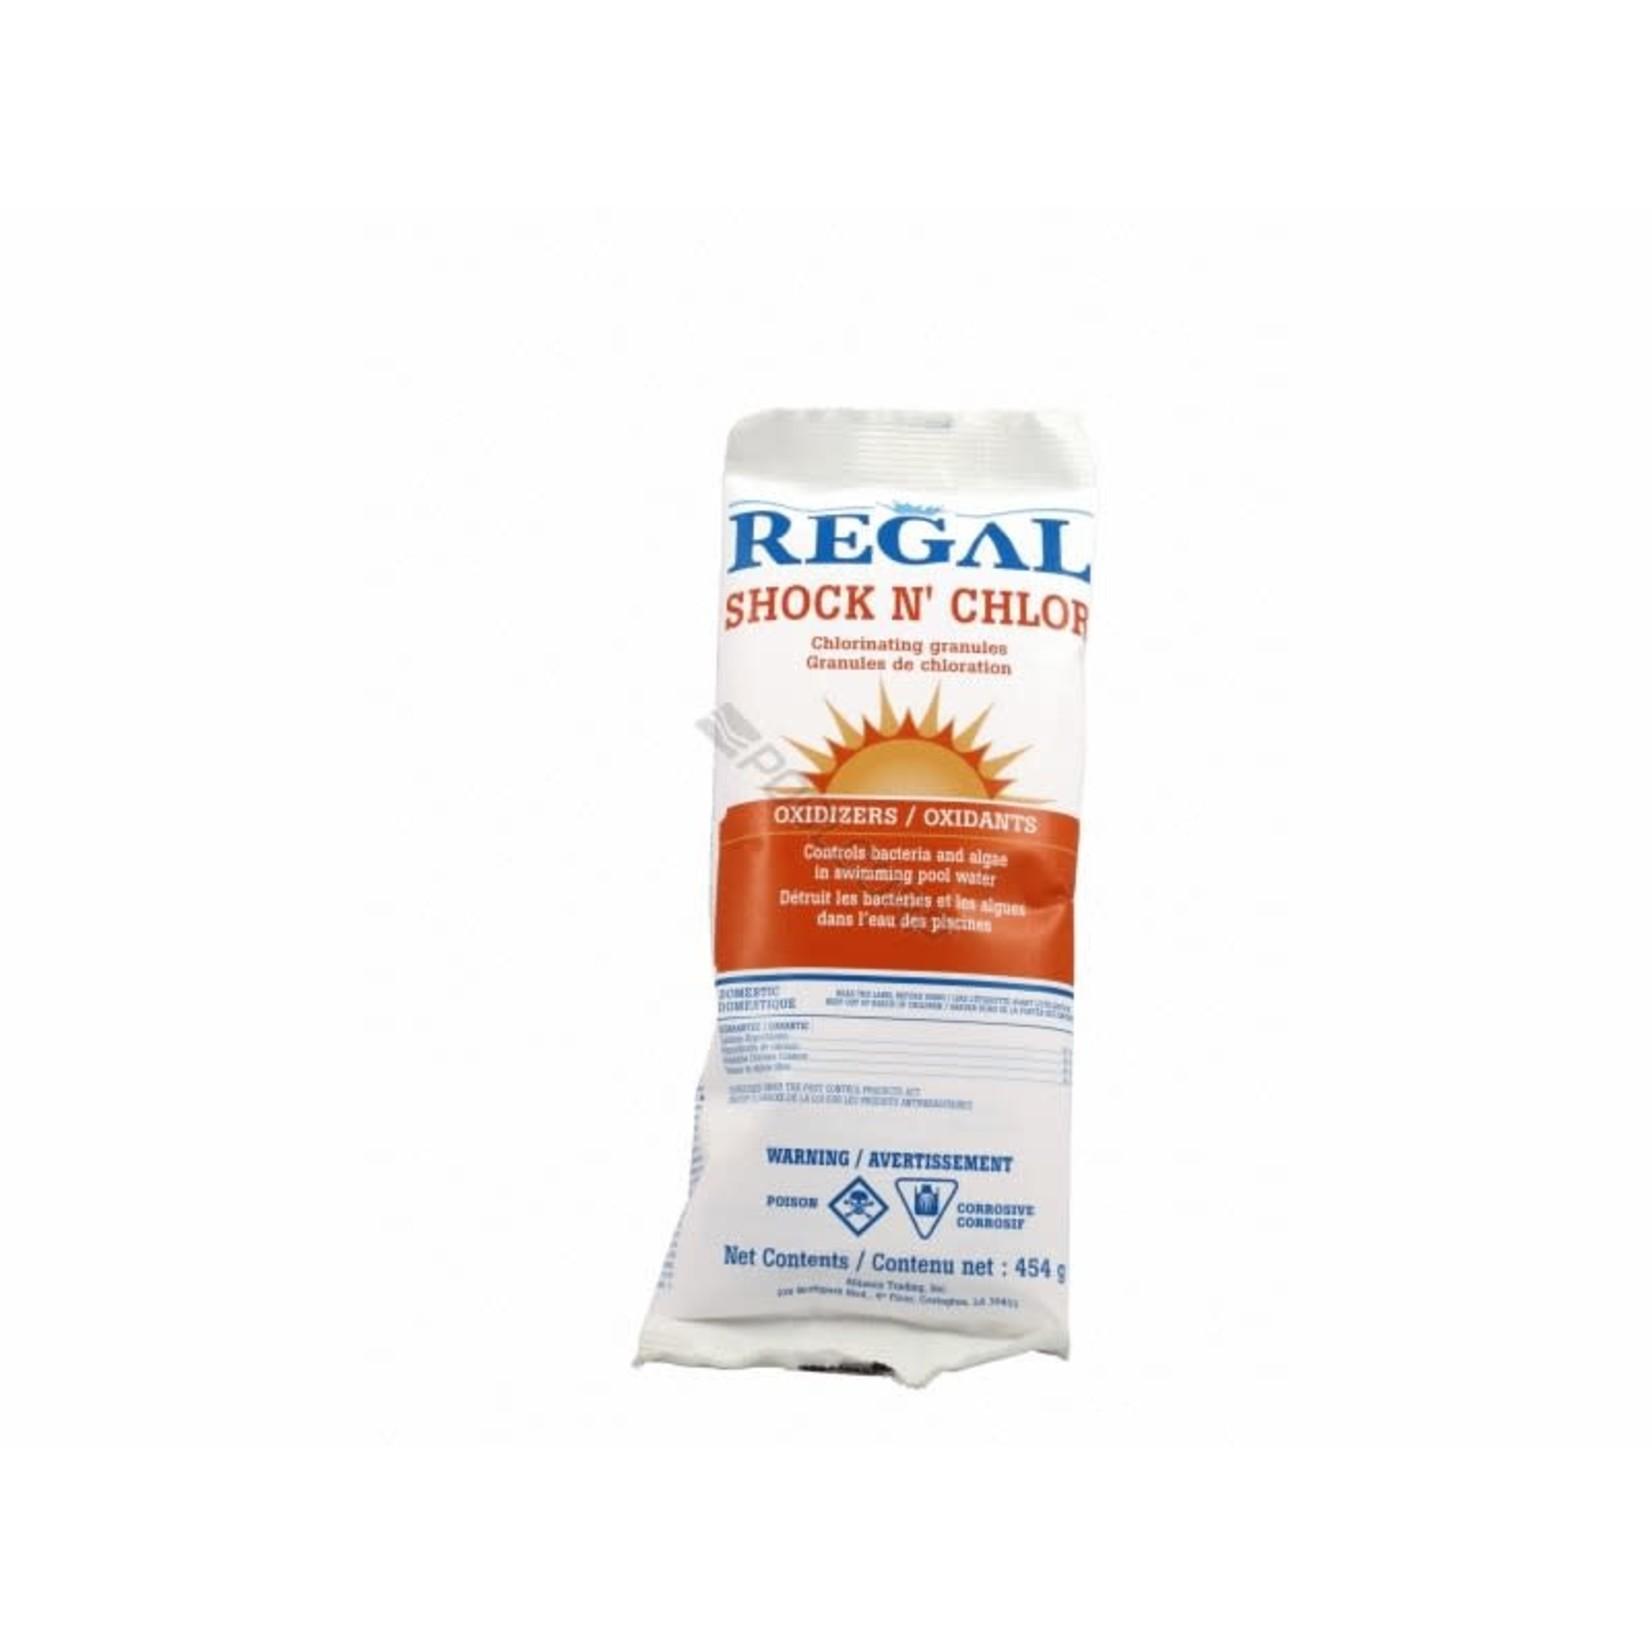 Regal REGAL SHOCK N' CHLOR 454